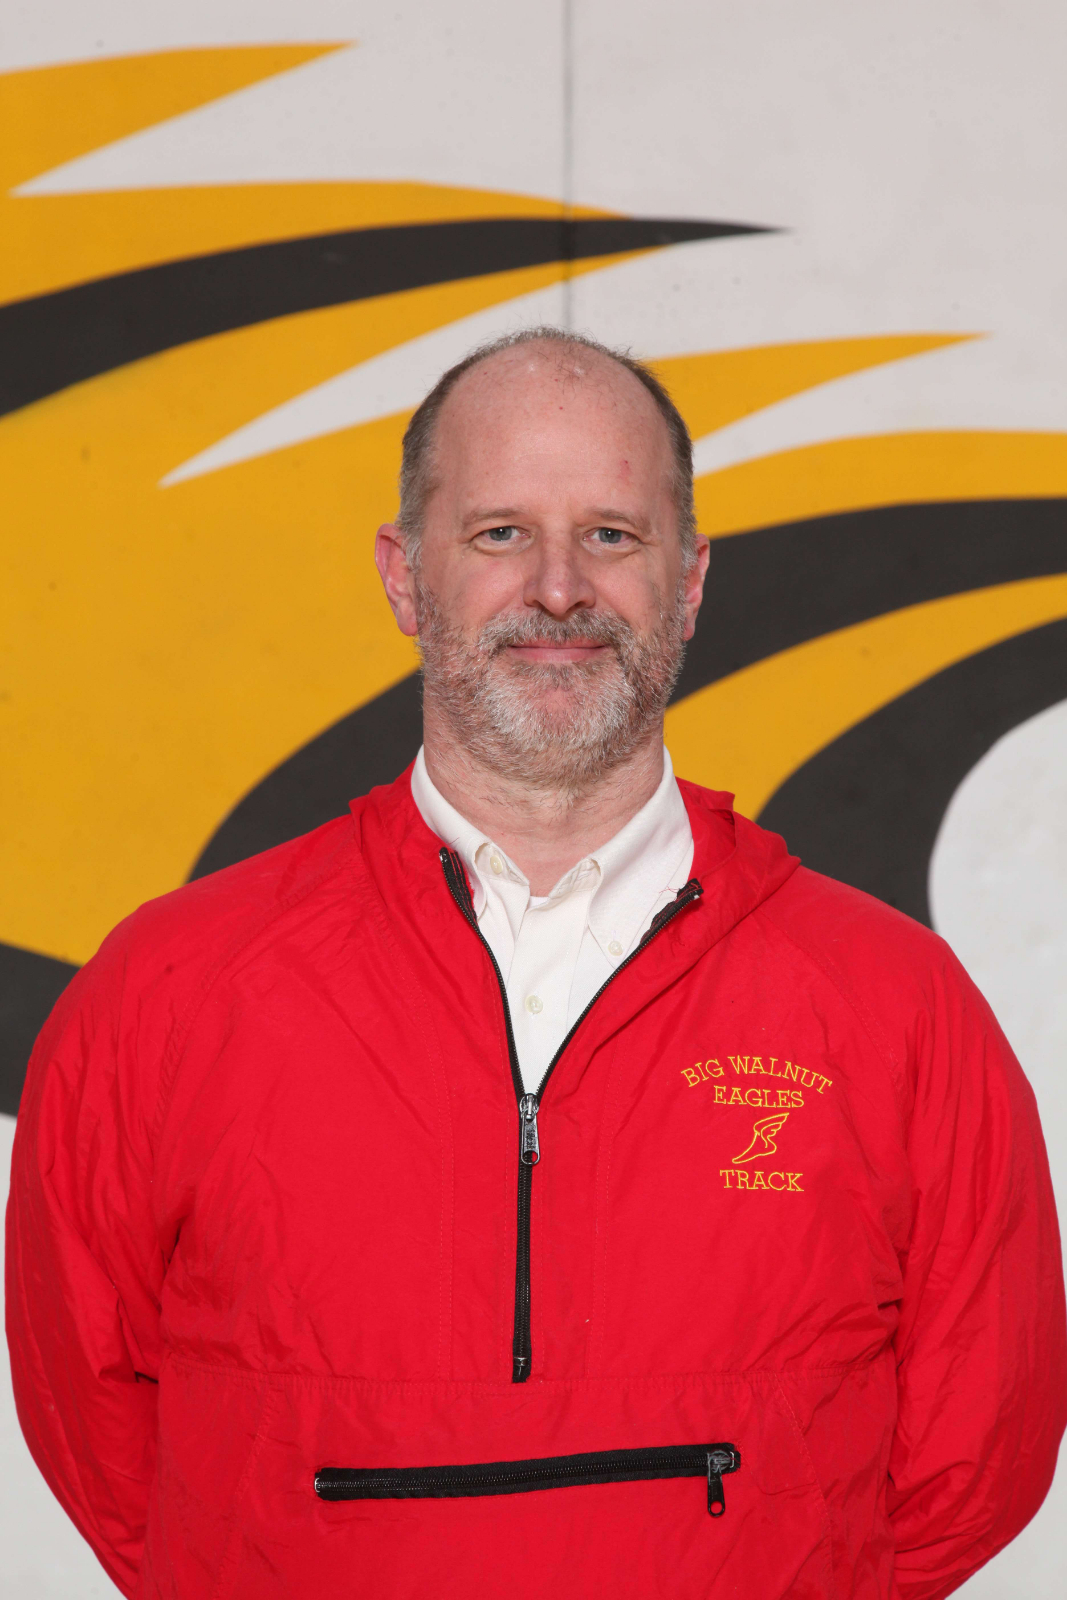 Joe Evener – Big Walnut High School Track Coach – keeps piling up the stats